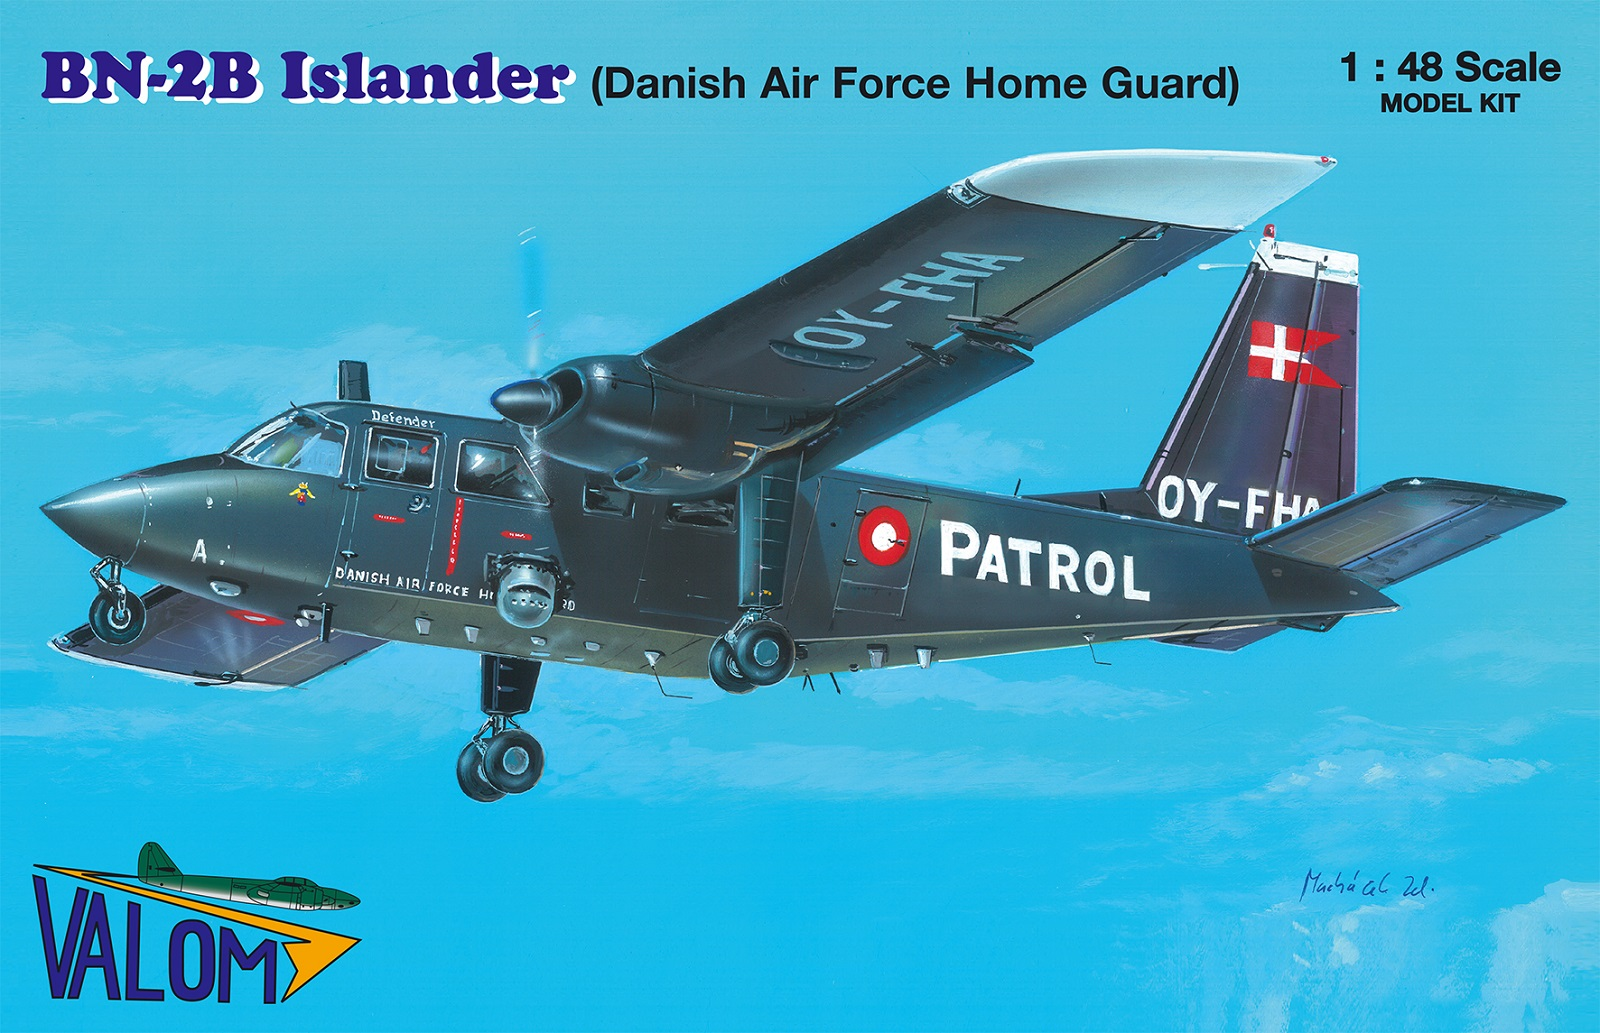 Valom Britten-Norman BN-2B Islander (DAFHG)